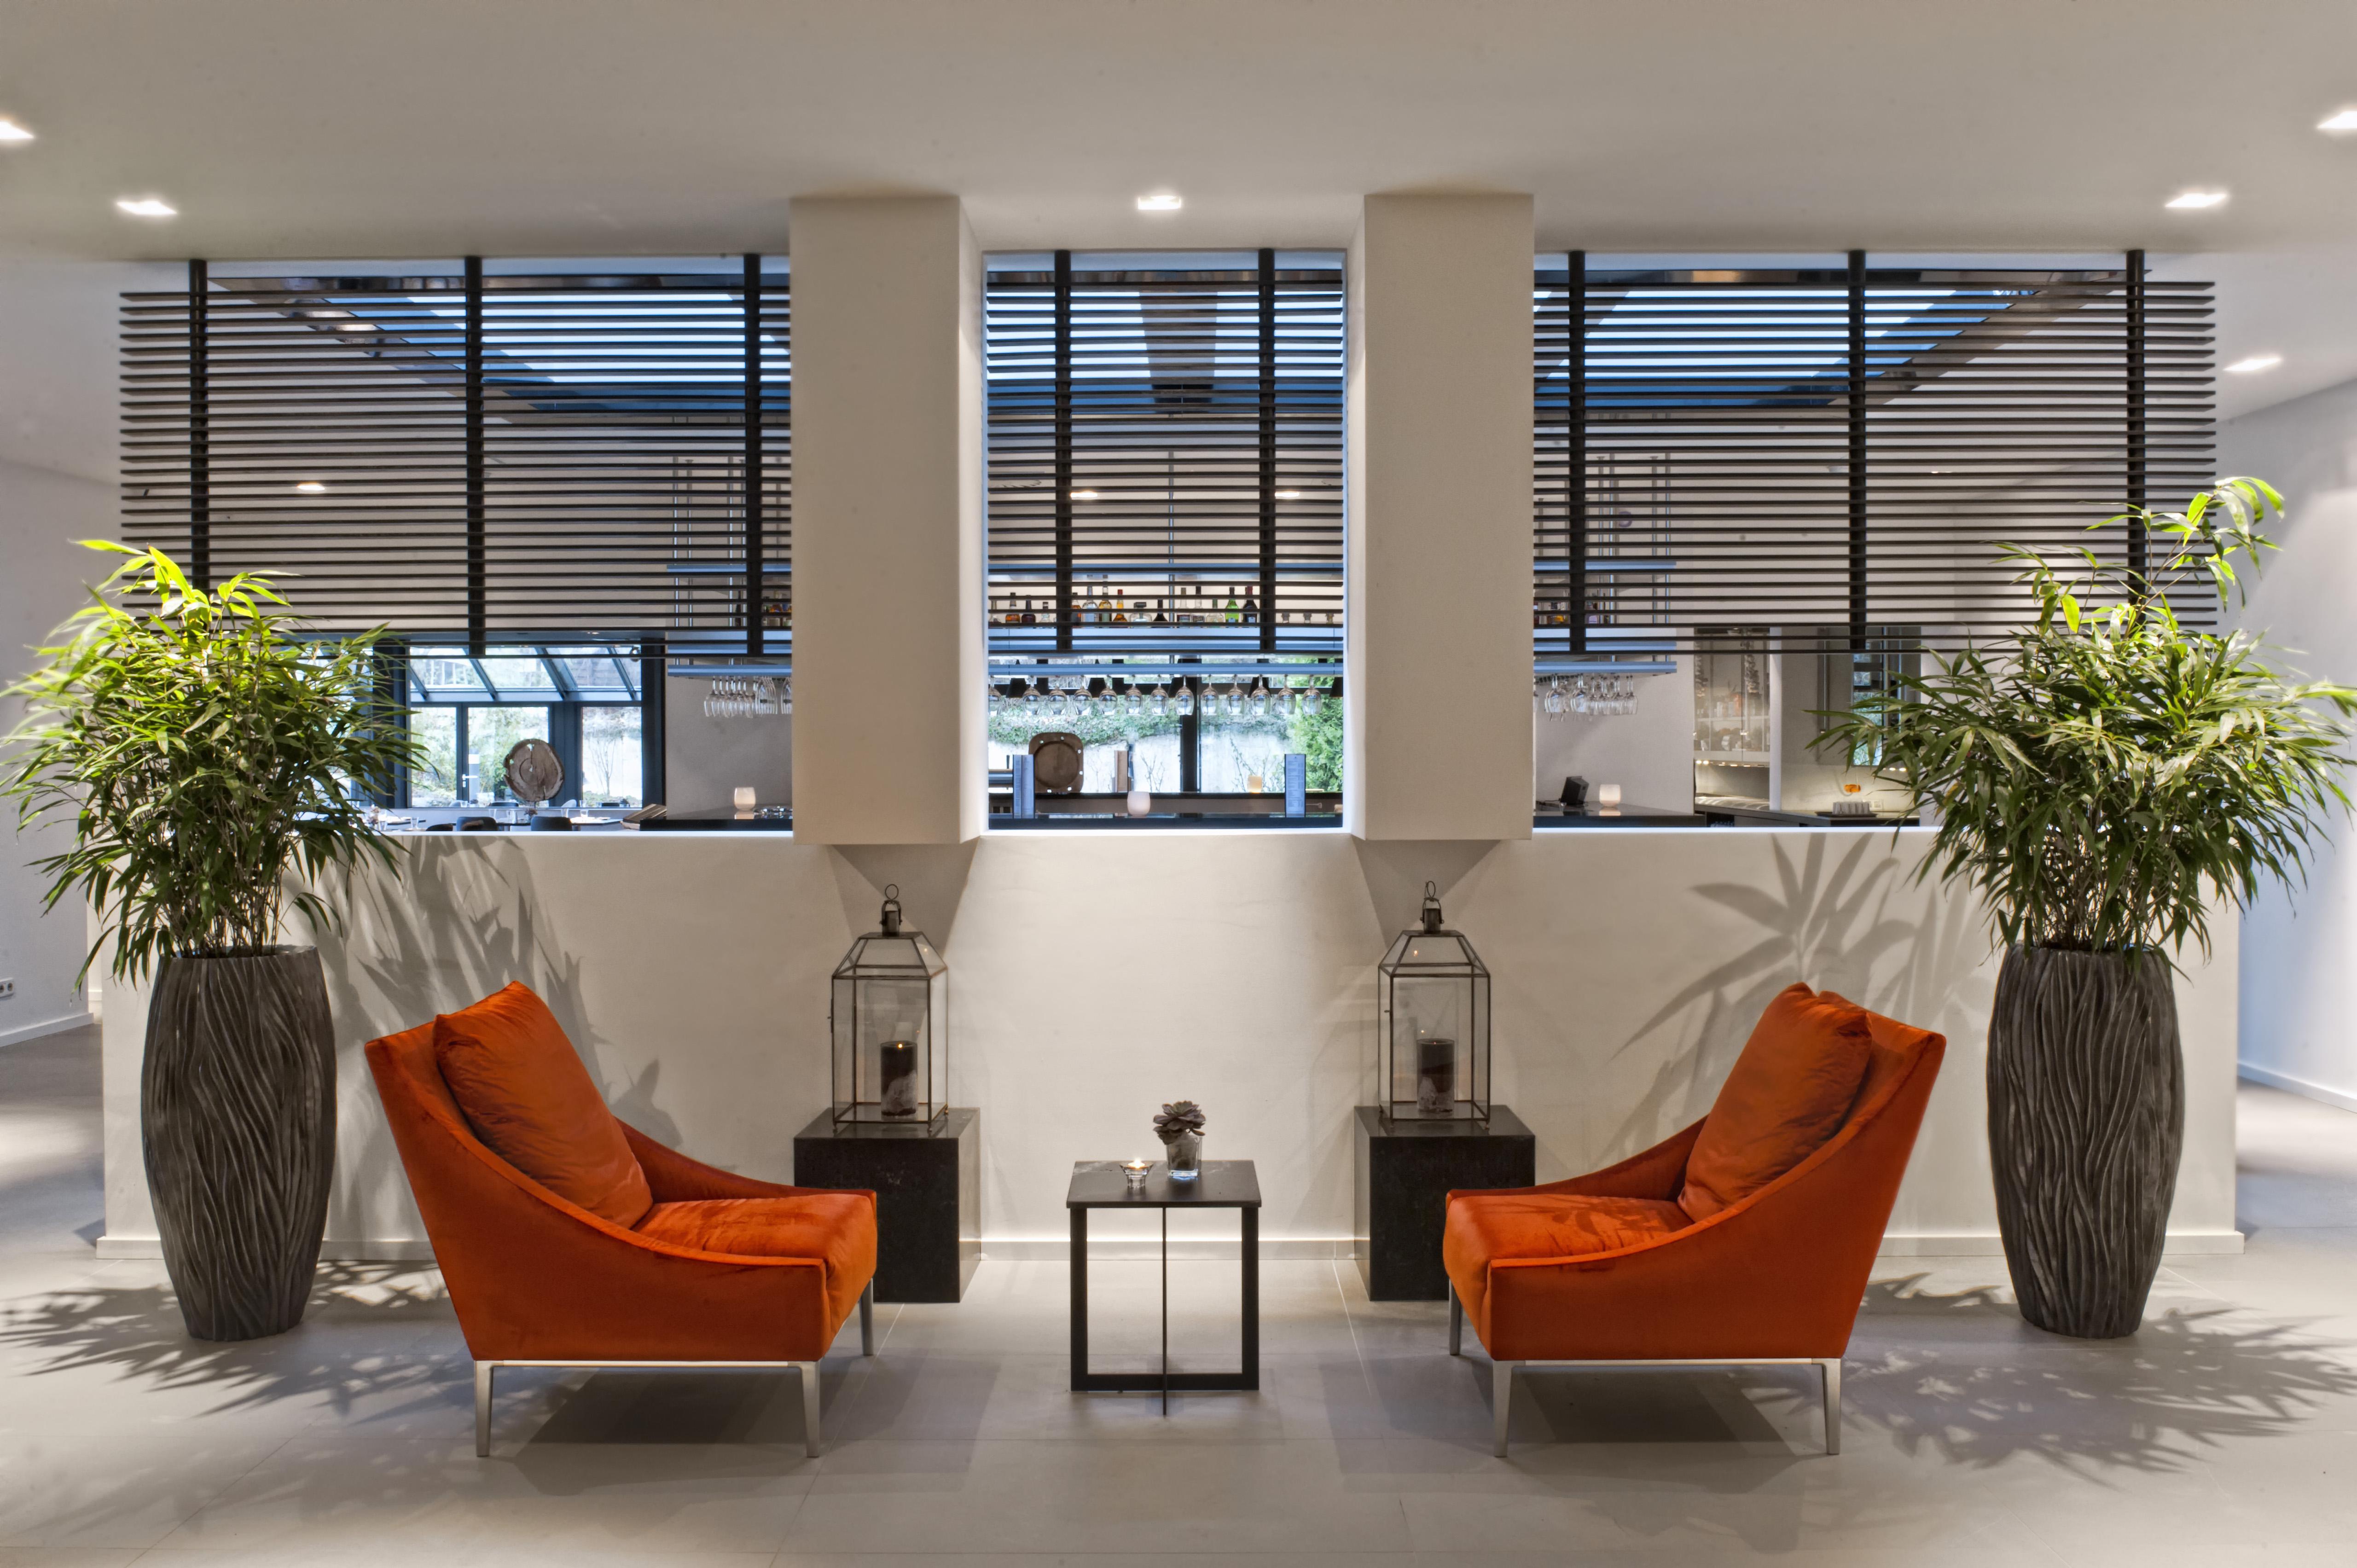 hotel stuttgart wyndham stuttgart airport messe businesshotel. Black Bedroom Furniture Sets. Home Design Ideas